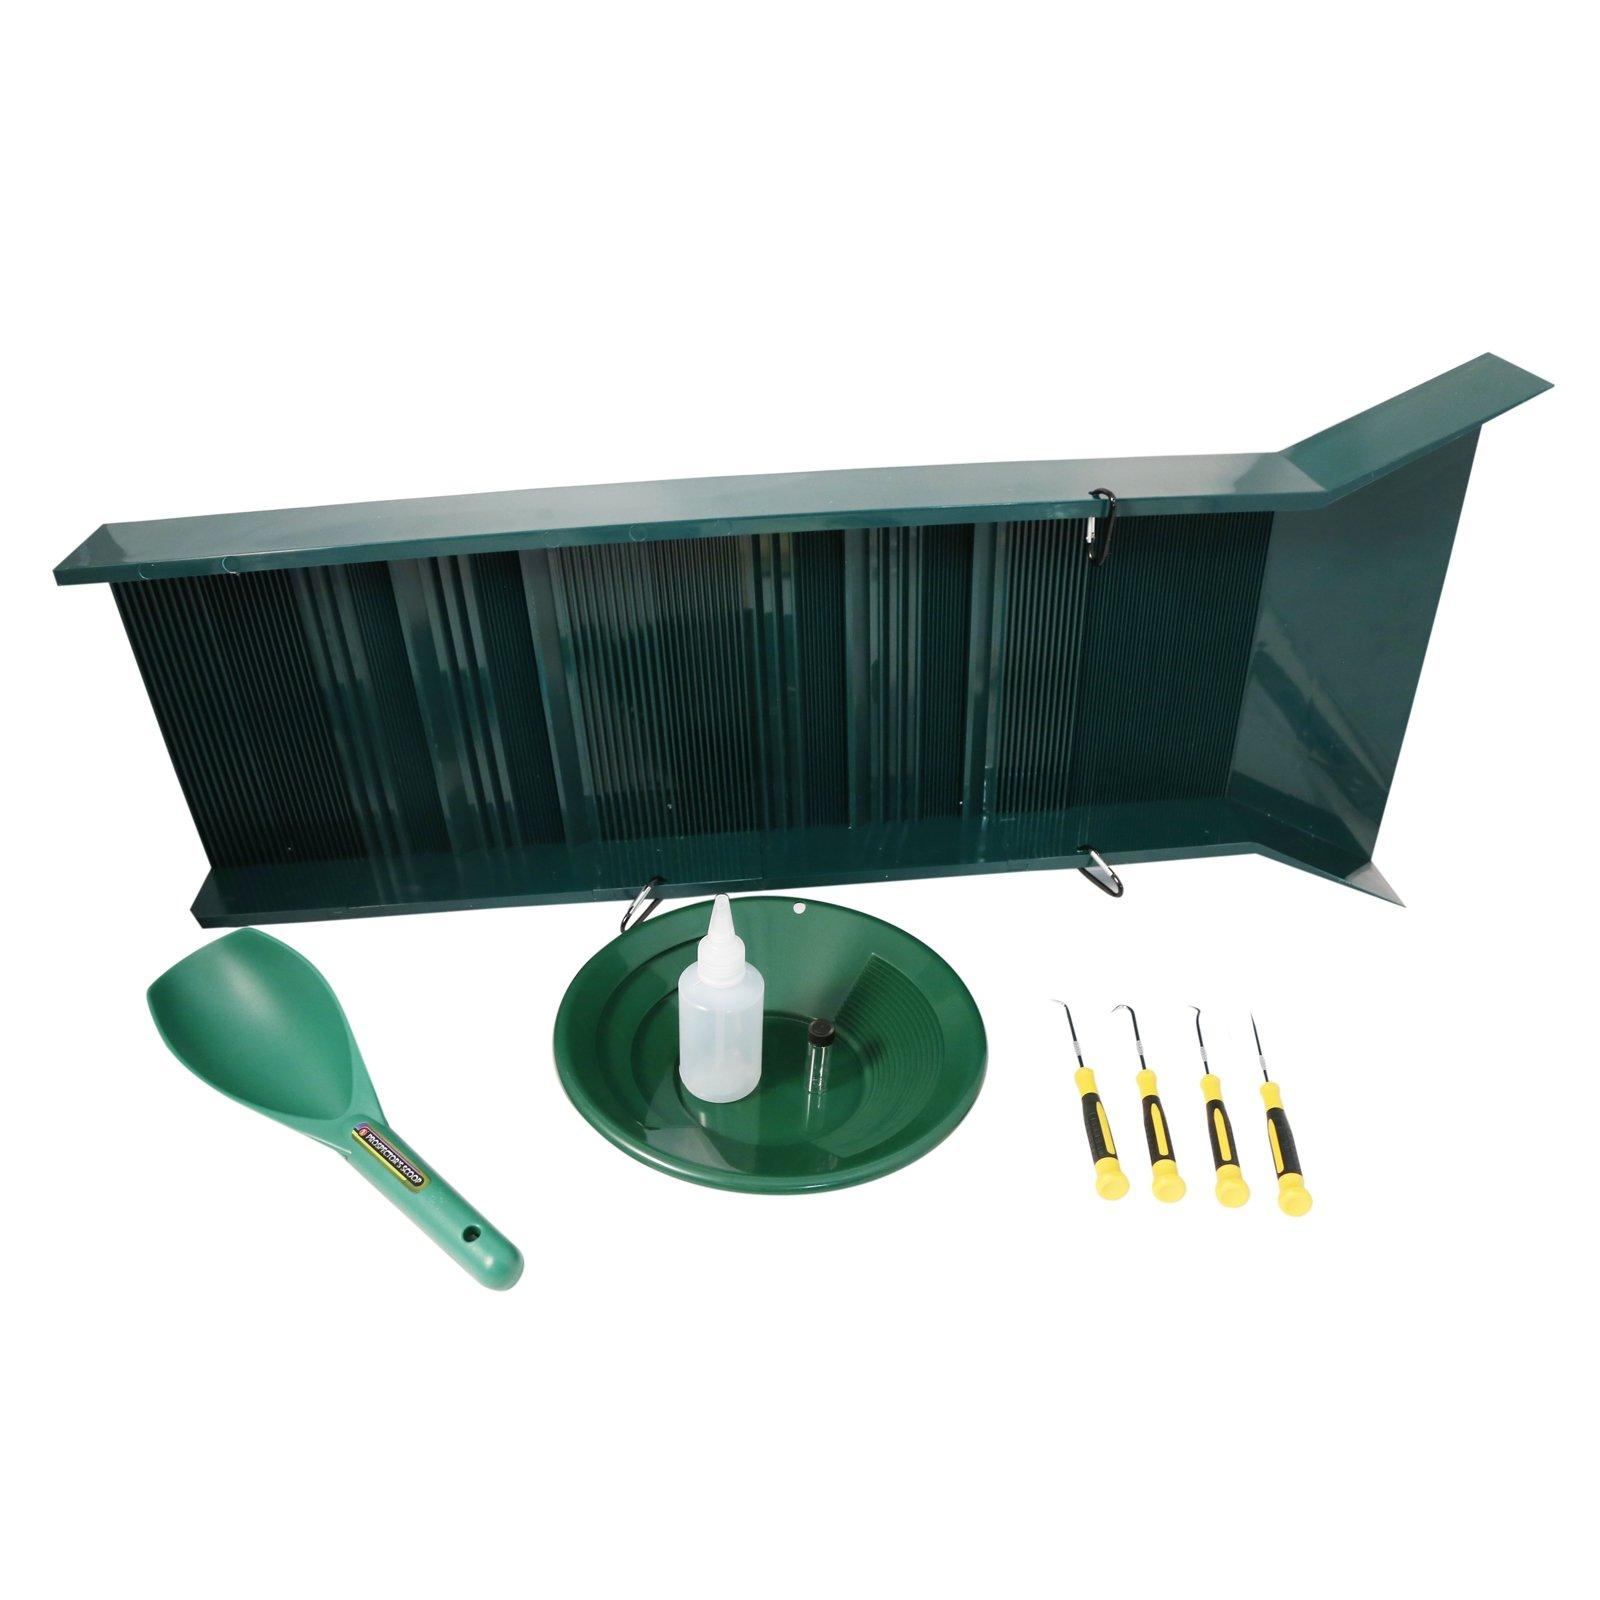 ASR Outdoor Sluice Box Gold Prospecting Kit Pan Vial Snifter Trowel Hooks 6pc